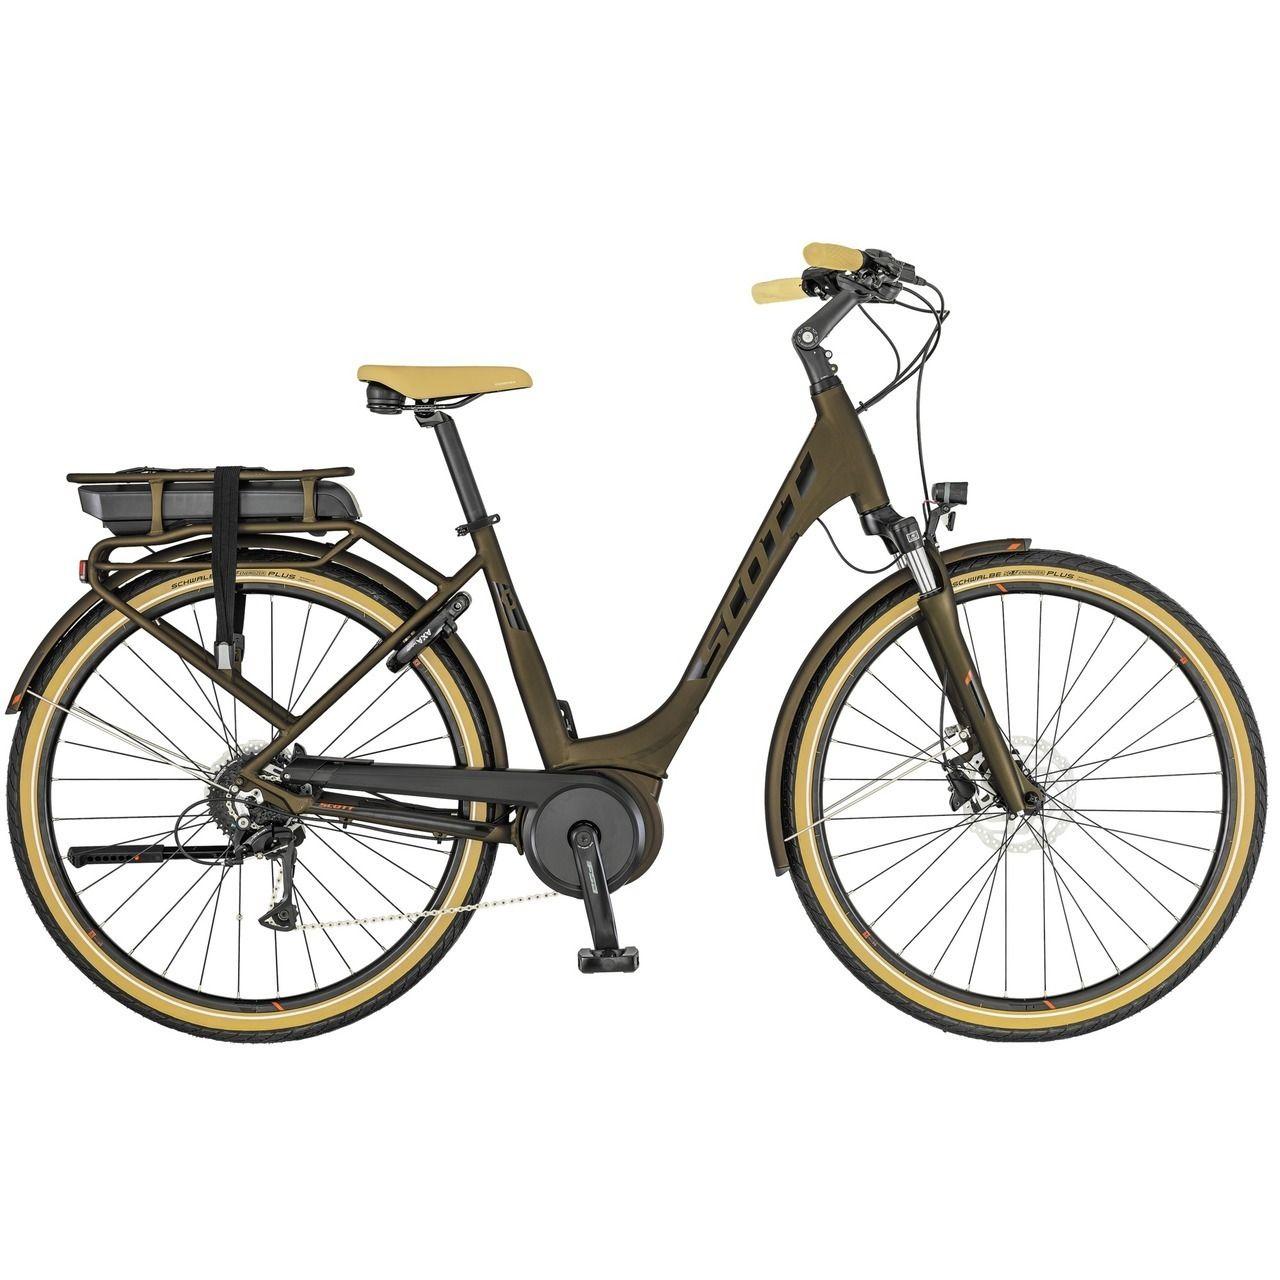 d14ea0cb782 Scott Electric | Sub Active eRide | Electric Urban/ Hybrid Bike | 2019